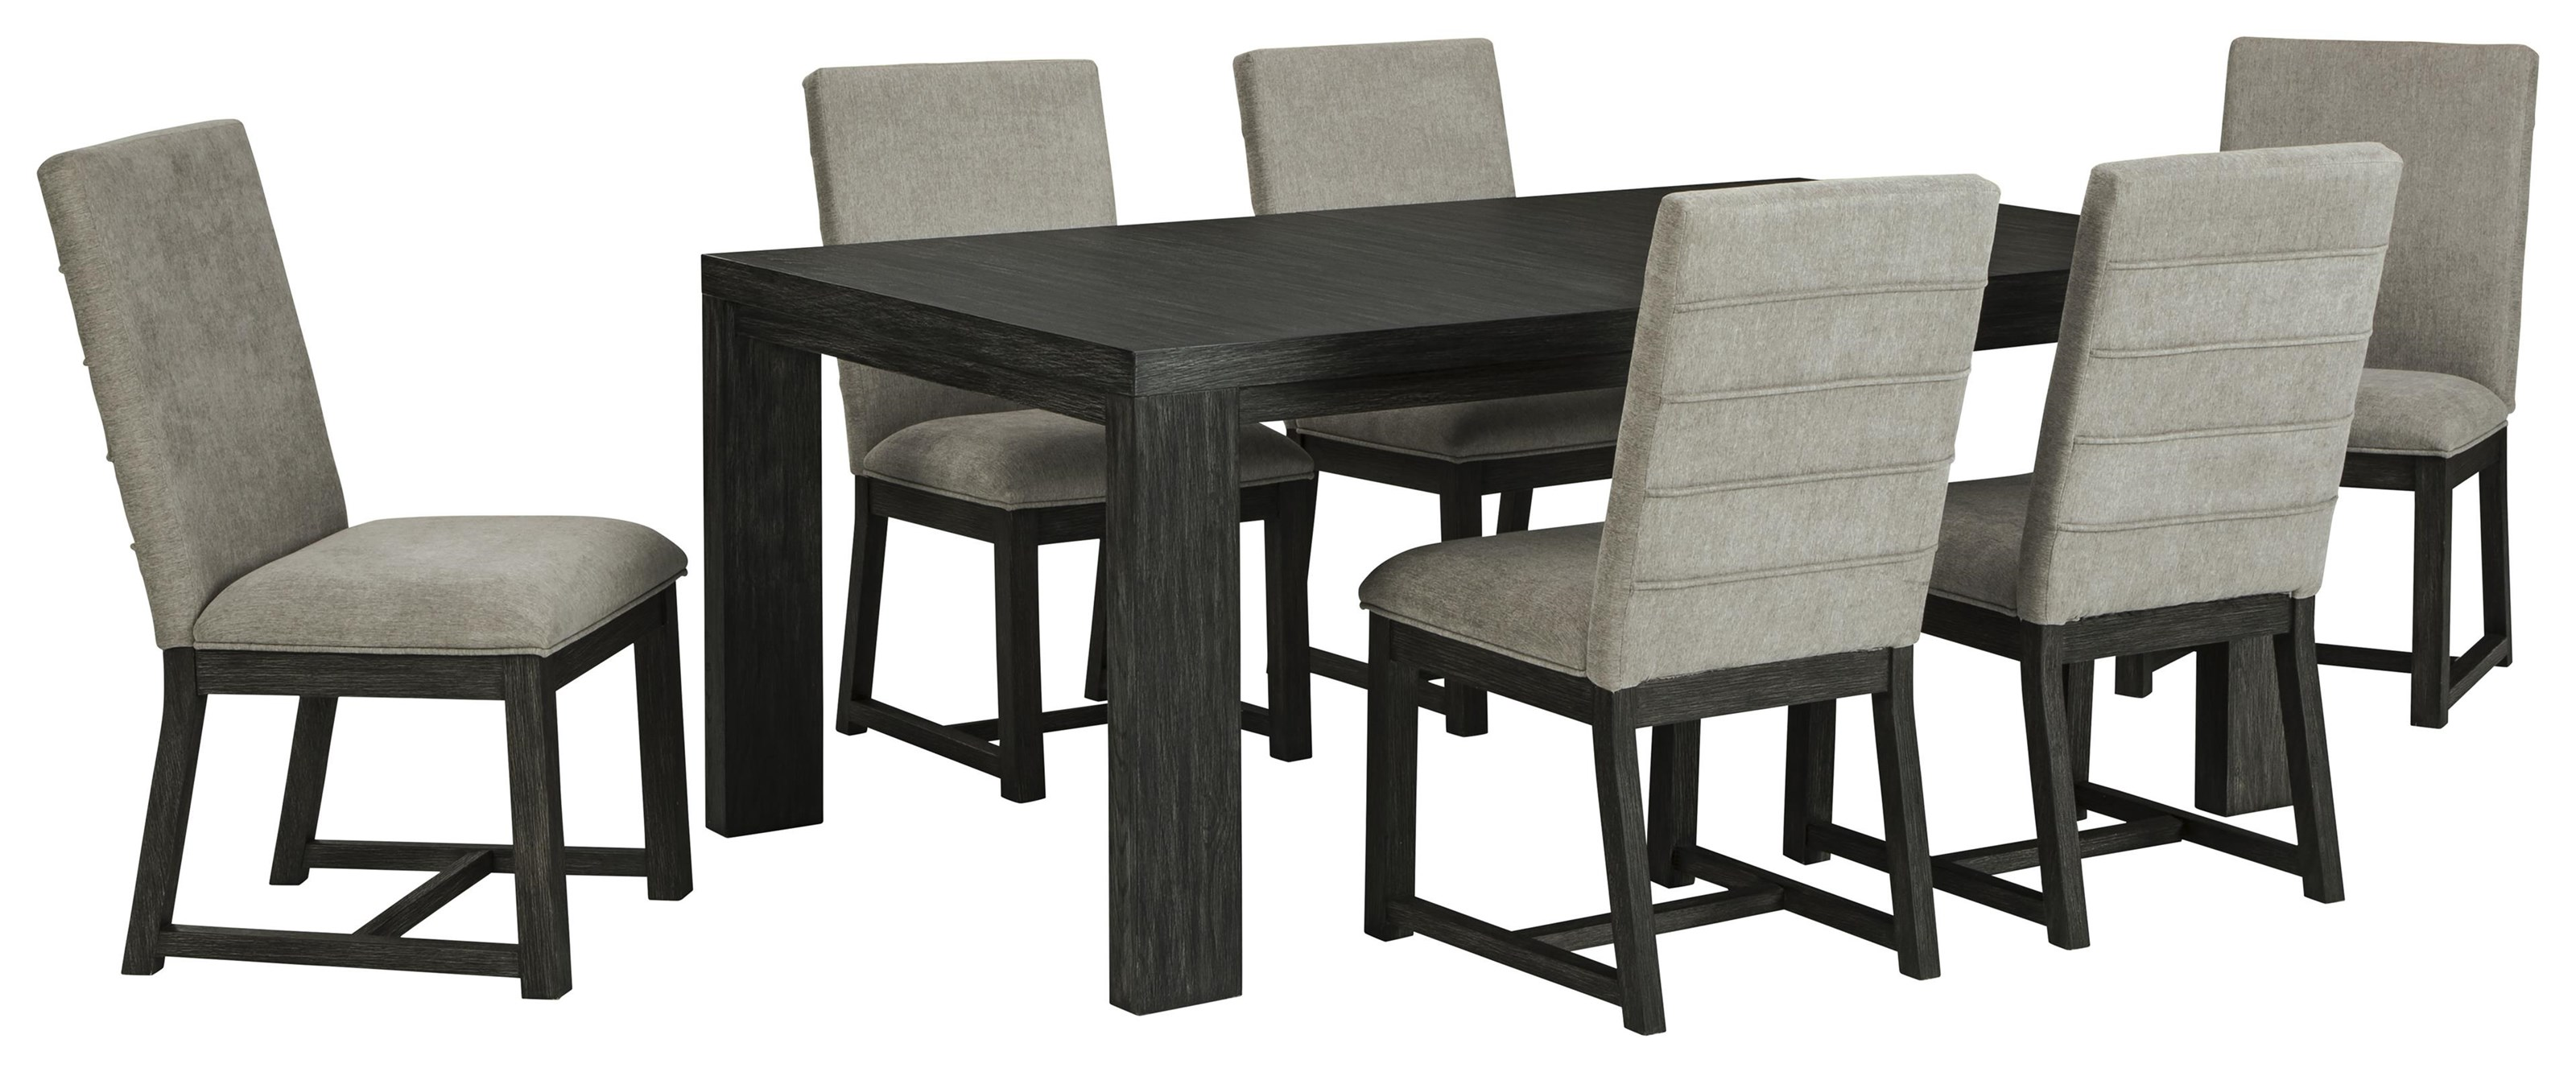 Bellvern 7 Piece Dining Room Set by Ashley Furniture at Sam Levitz Furniture